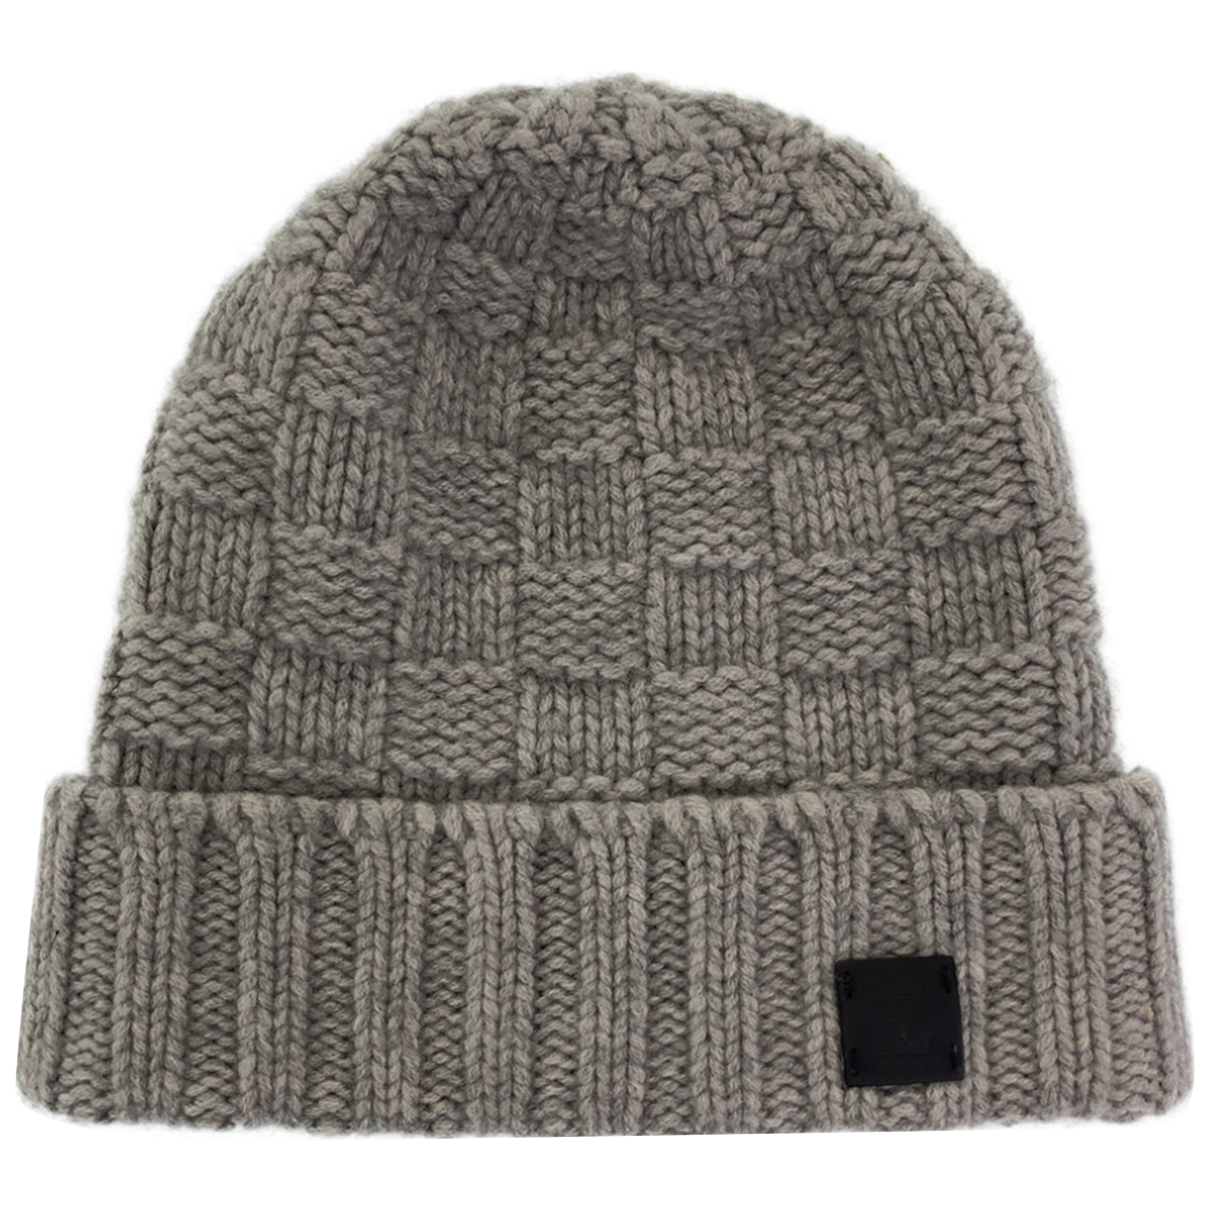 Louis Vuitton N Cashmere hat for Women M International